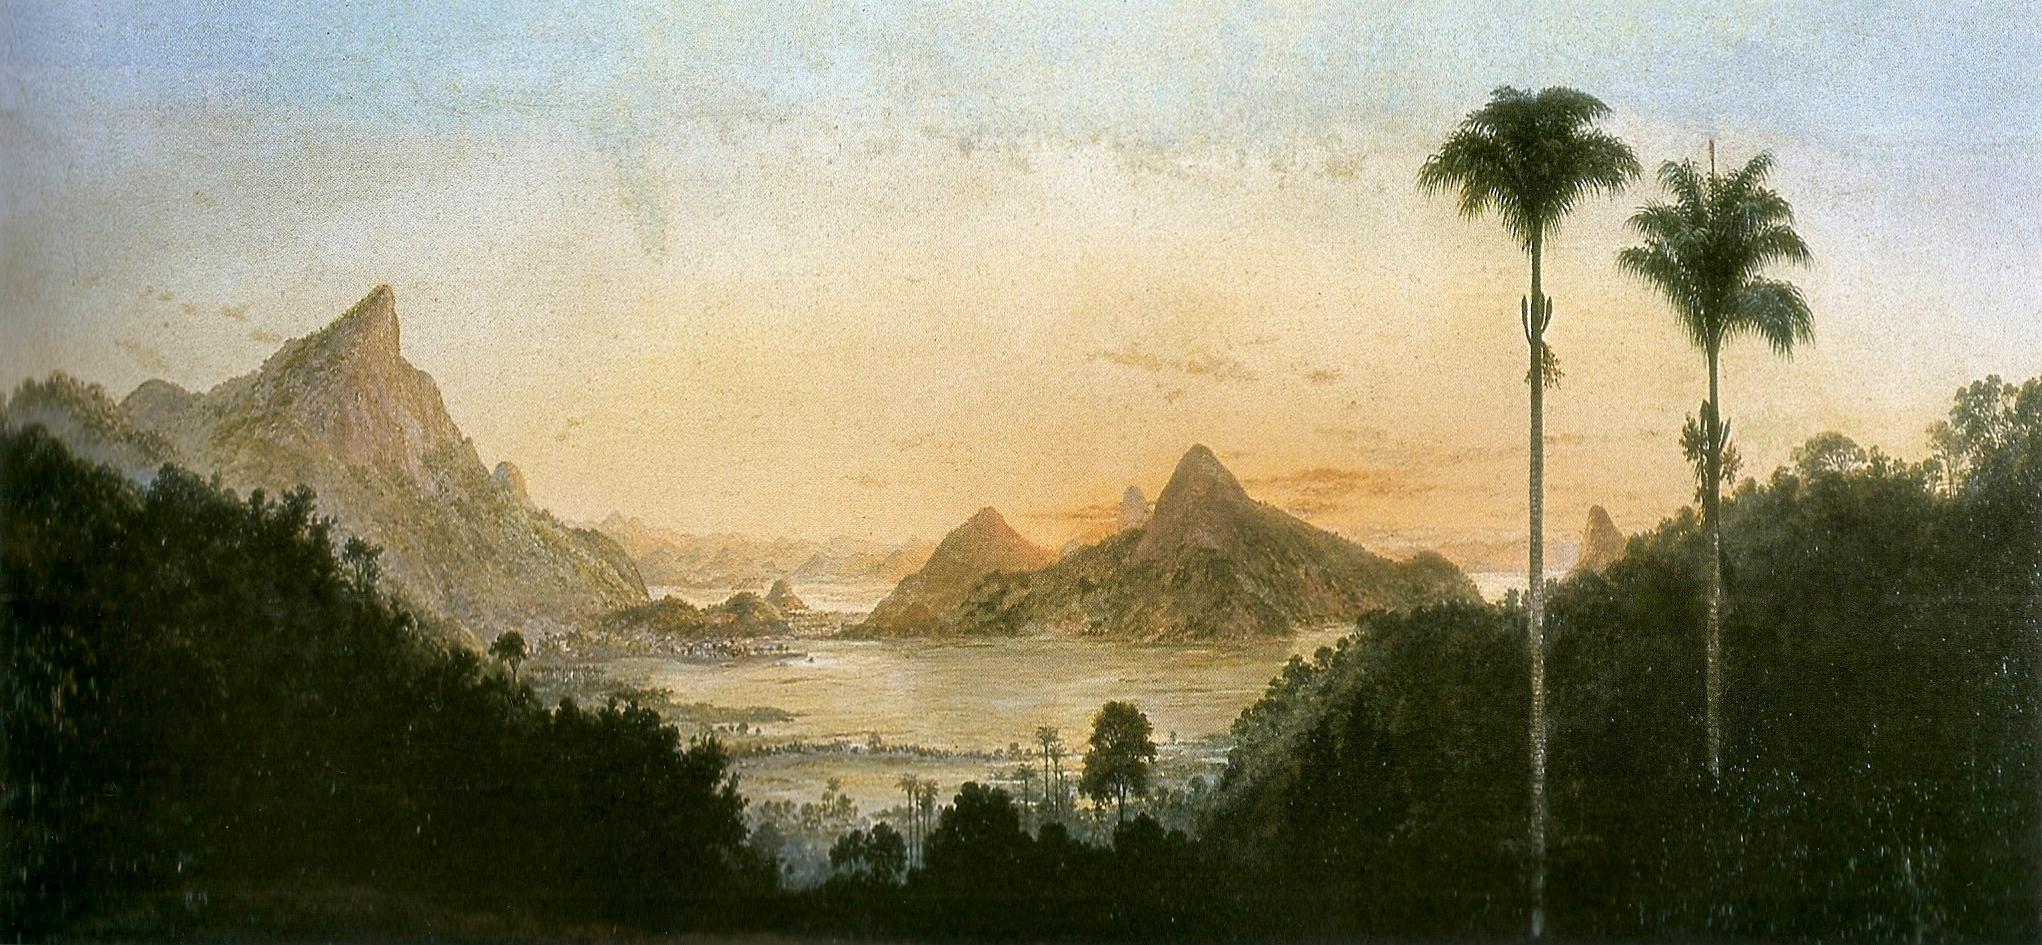 Ficheiro:Nicola Facchinetti - Lagoa Rodrigo de Freitas, Rio de Janeiro, ca. 1884.jpg